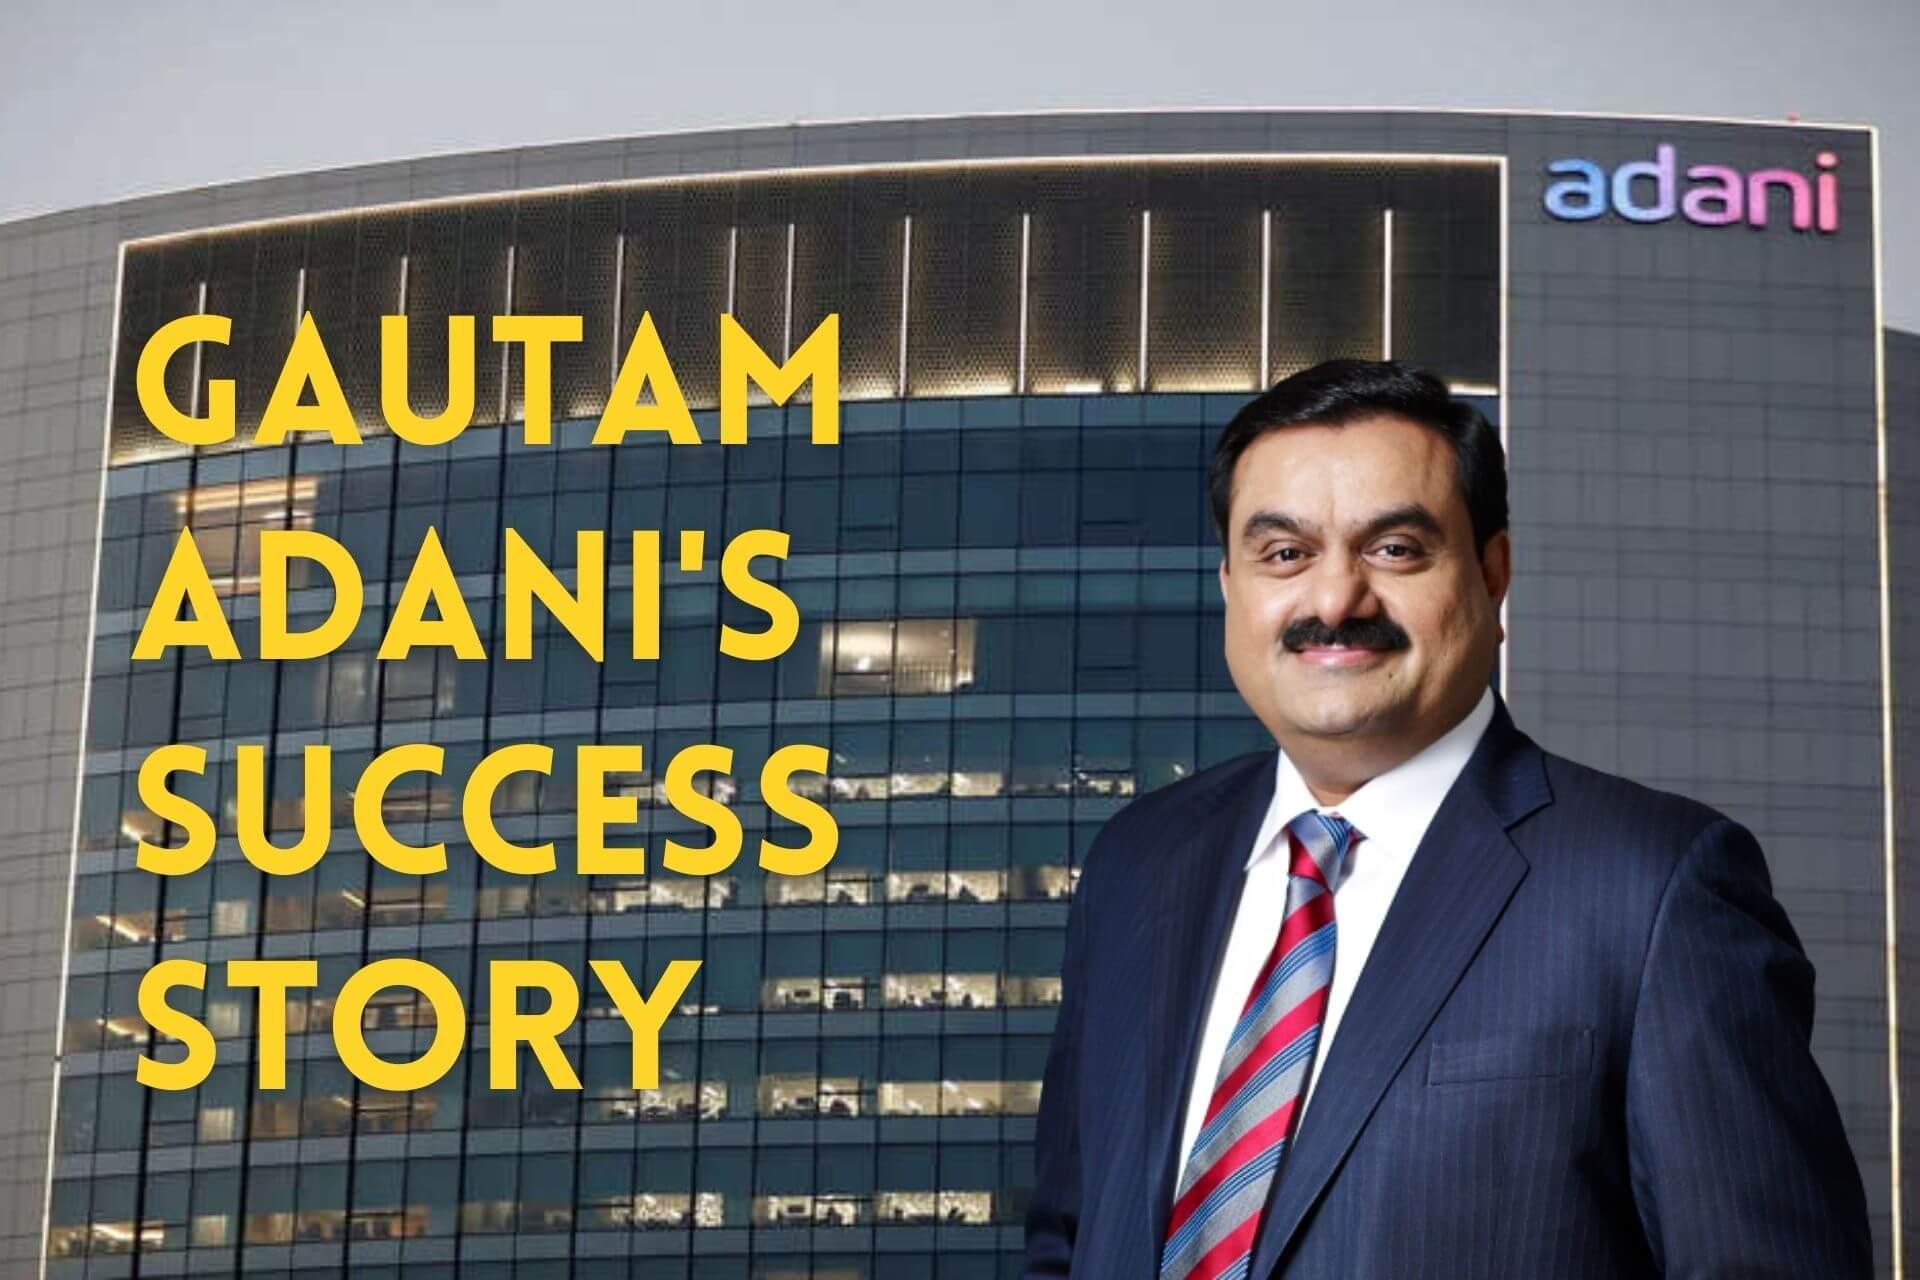 Gautam Adani's Success Story – India's 2nd Richest Man Biography!